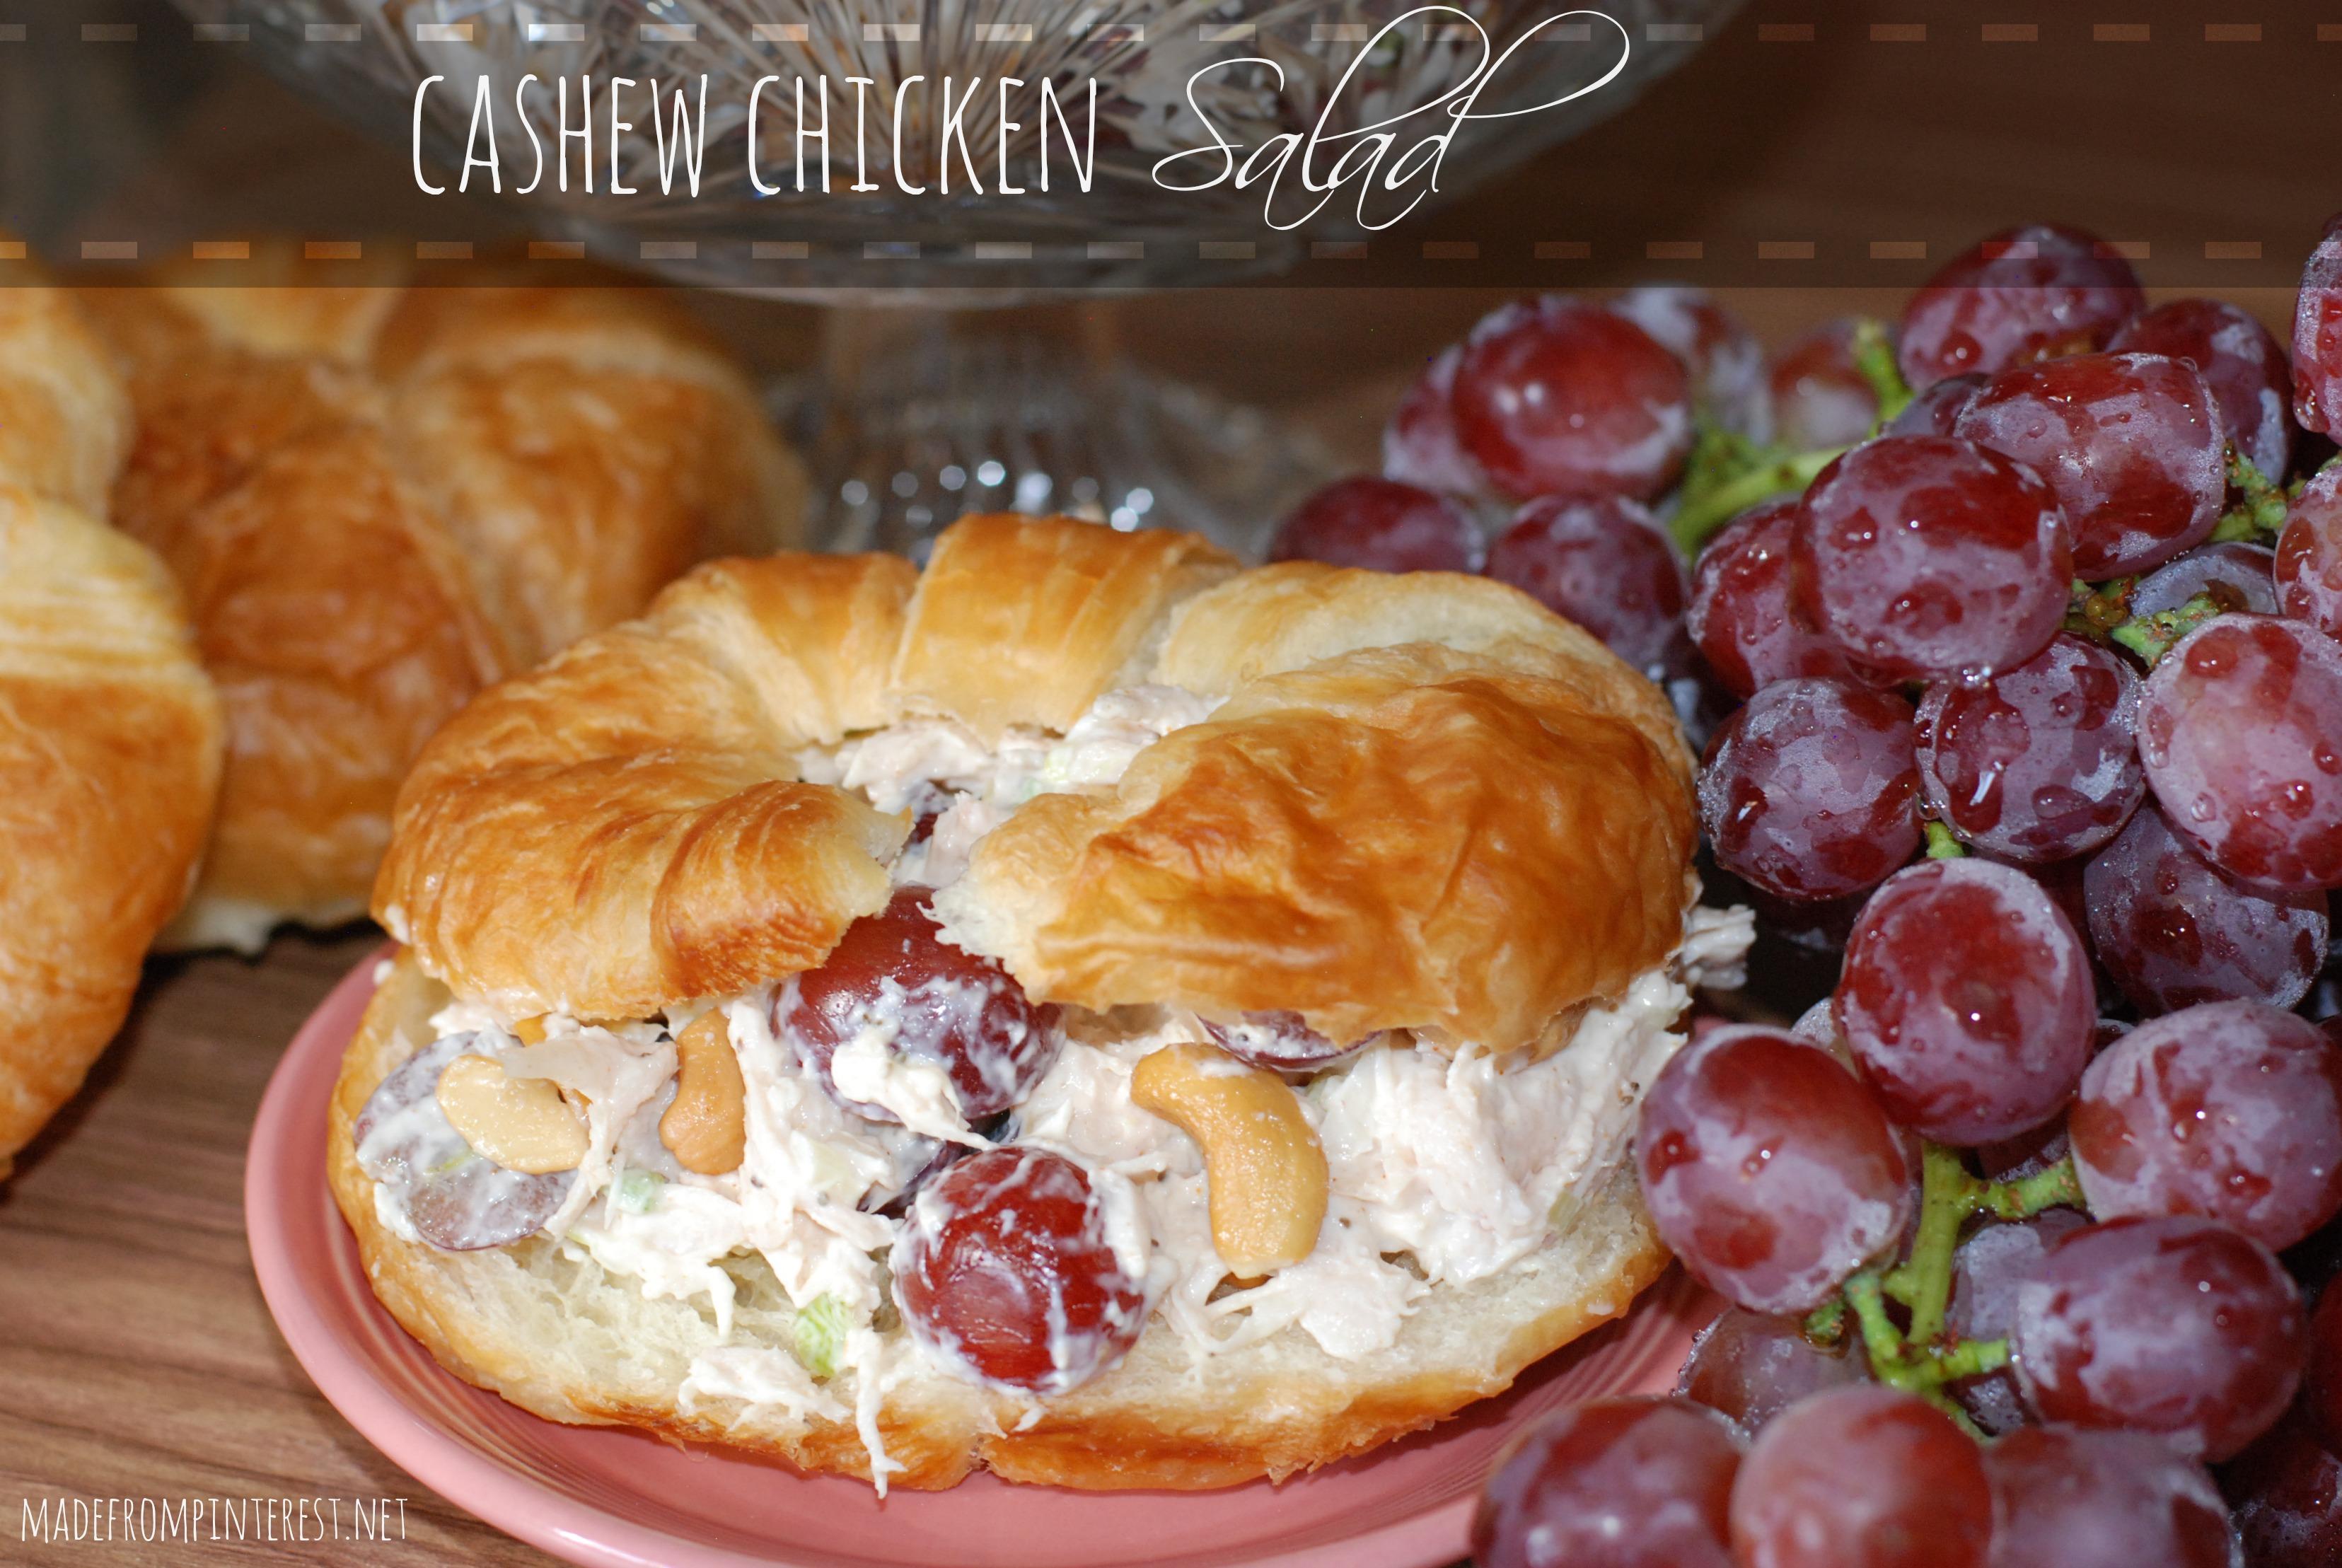 Cashew Chicken Salad Tgif This Grandma Is Fun